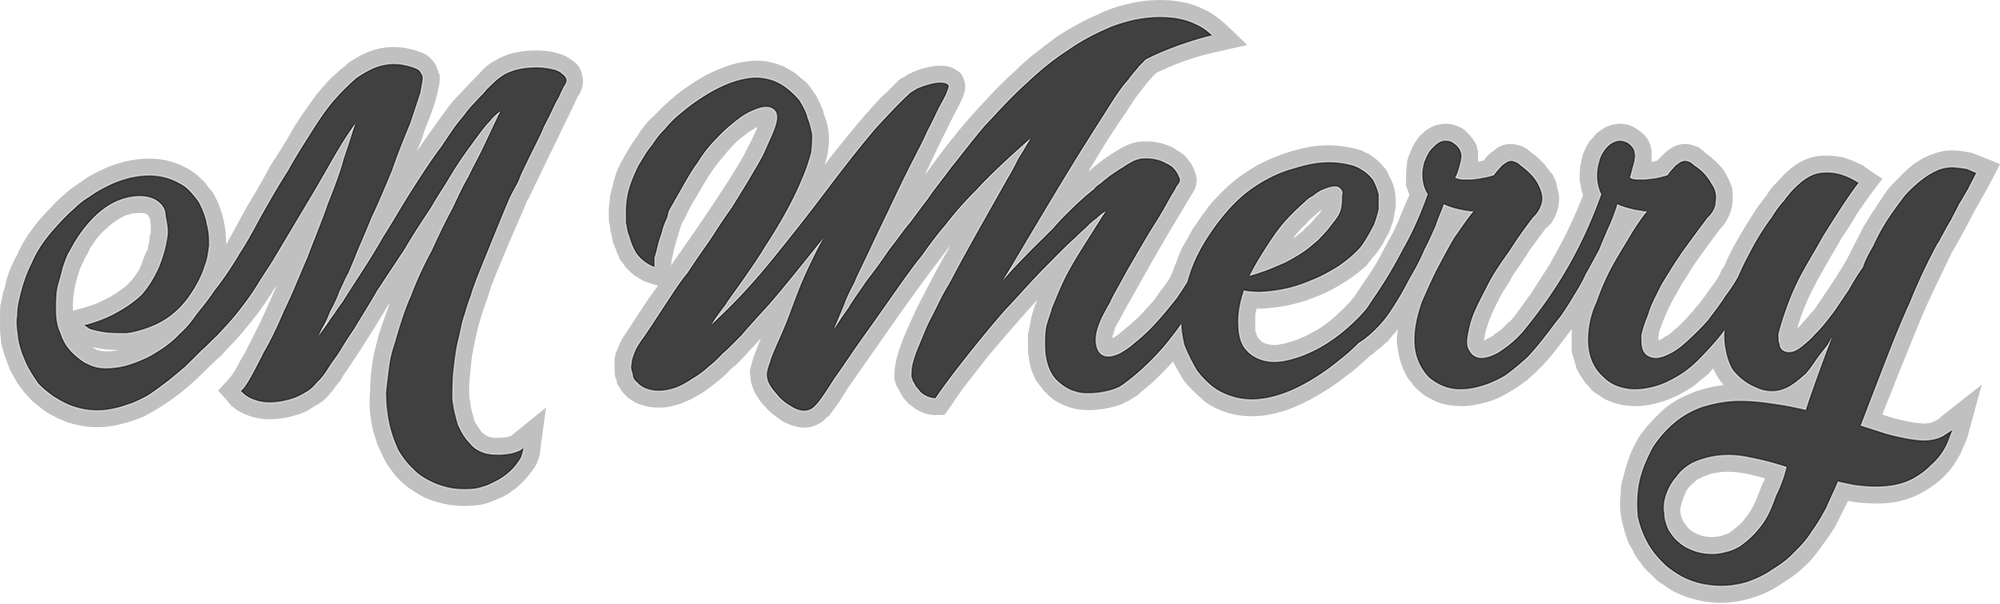 M Wherry logo